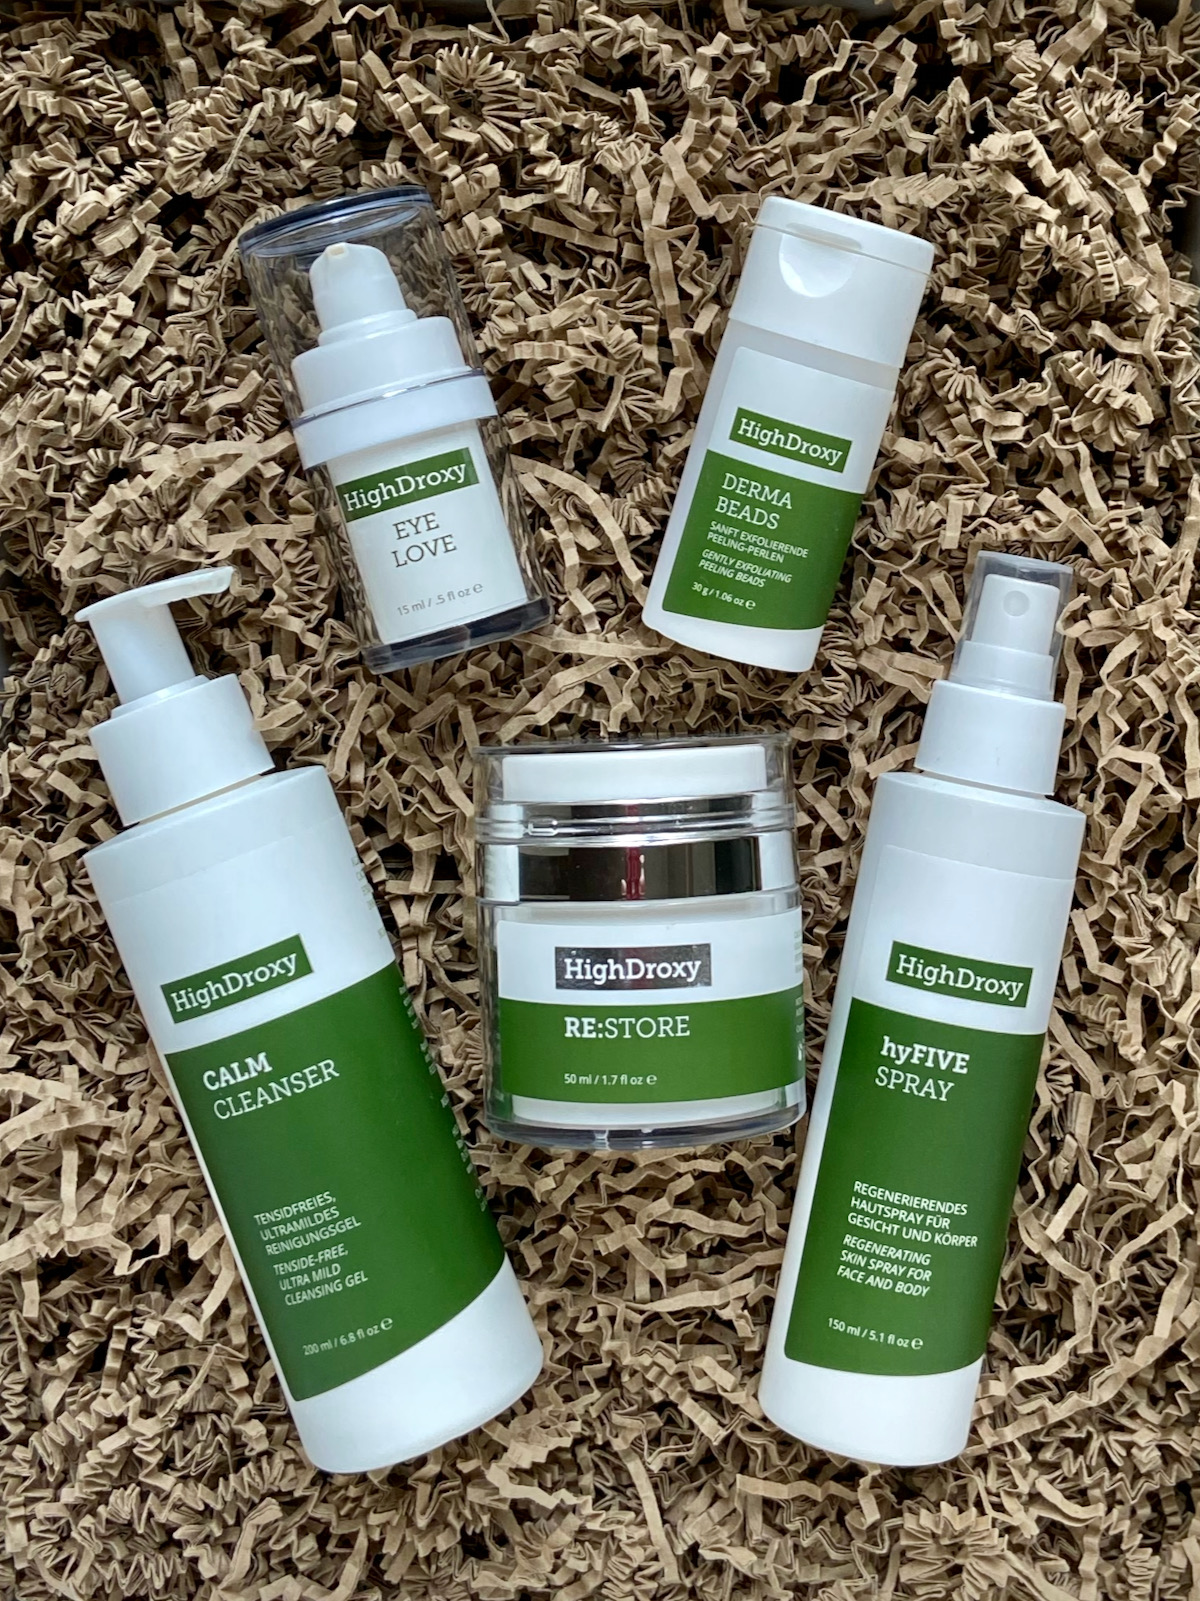 HighDroxy Lieblinge Mai 2021 Calm Cleanser Eye Love Derma BEads RE-STORE hyFIVE Spray